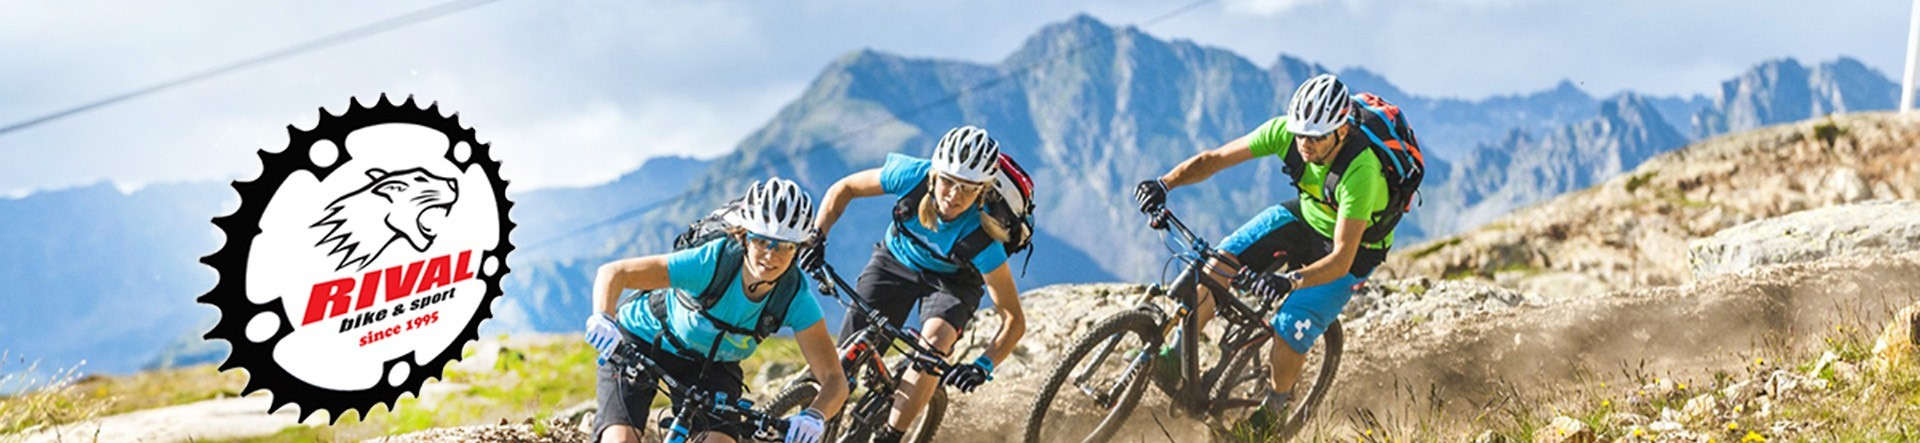 logo Rival bike sport